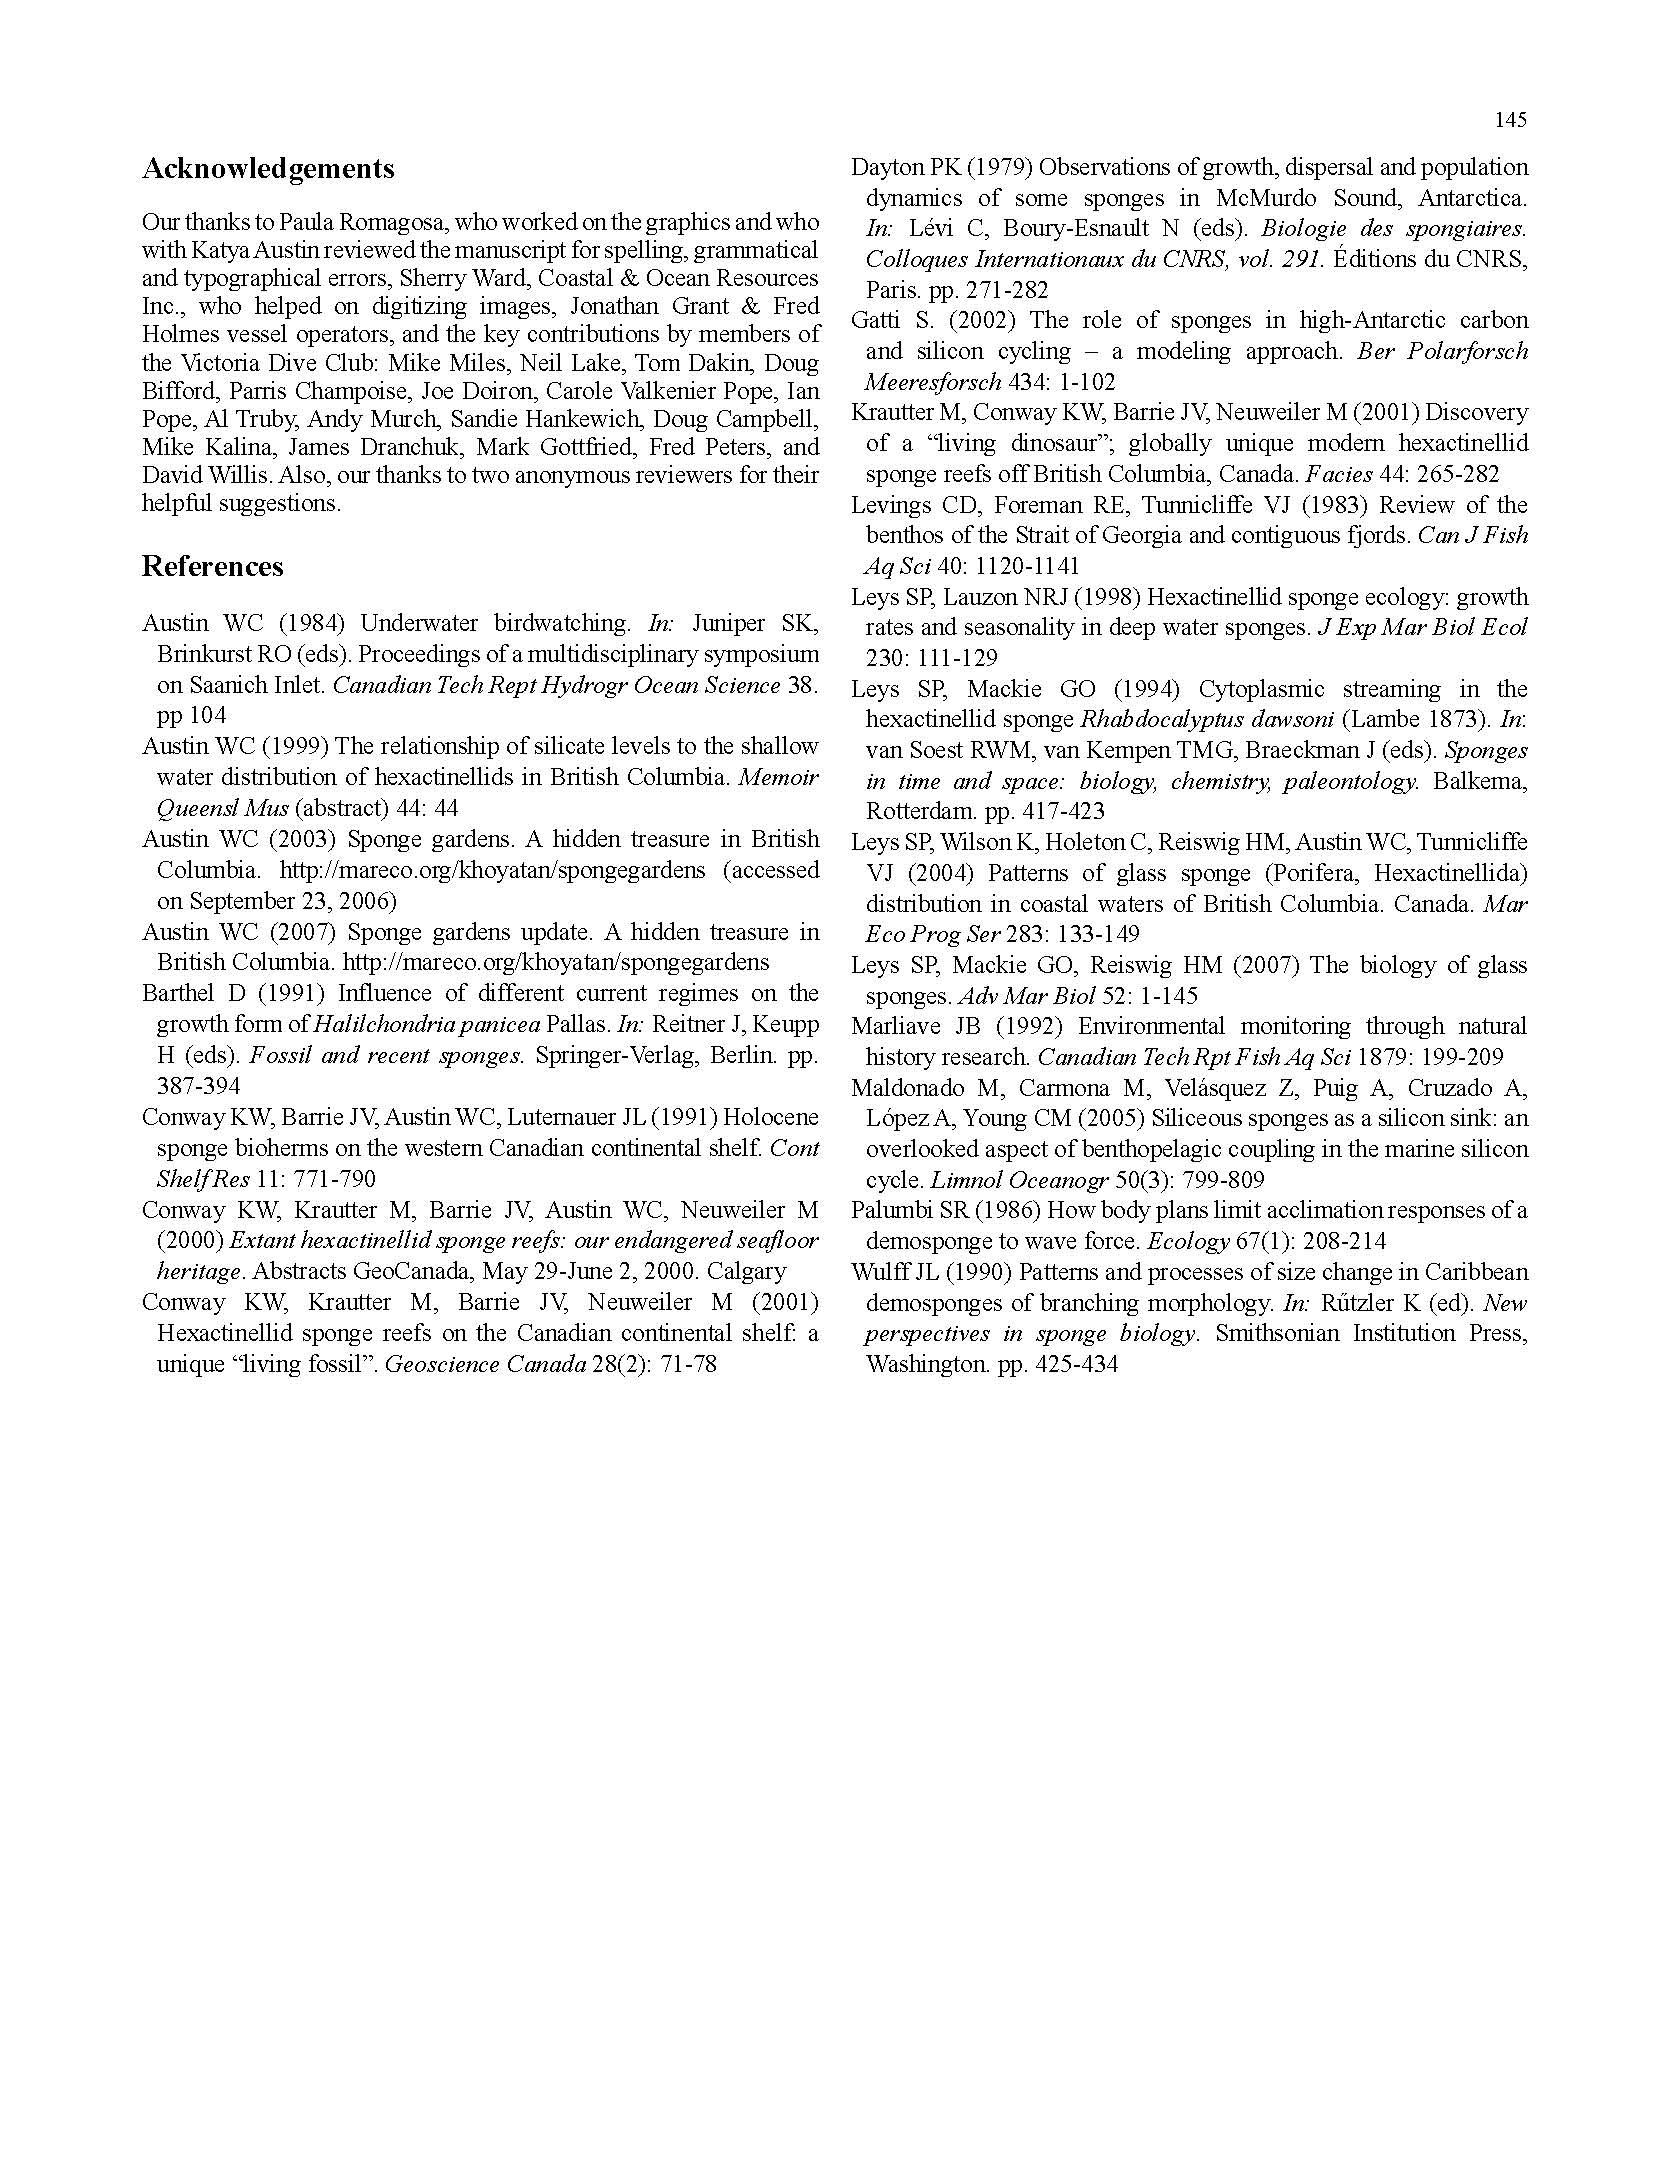 Austin et al - Growth and morphology of Aphrocallistes vastus_Page_7.jpg